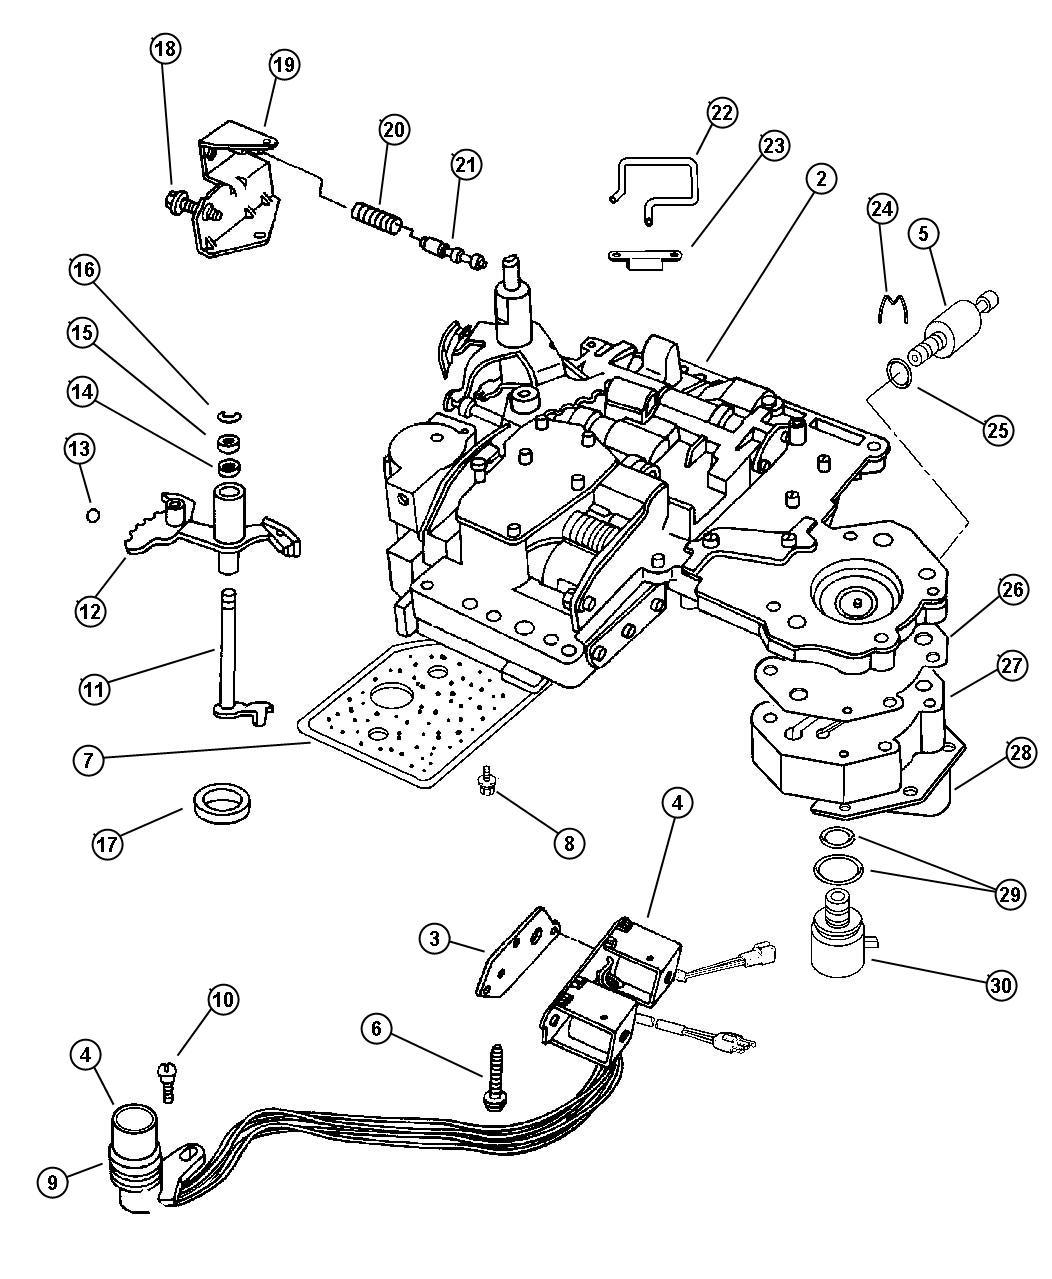 jeep aisin ax15 transmission parts diagram